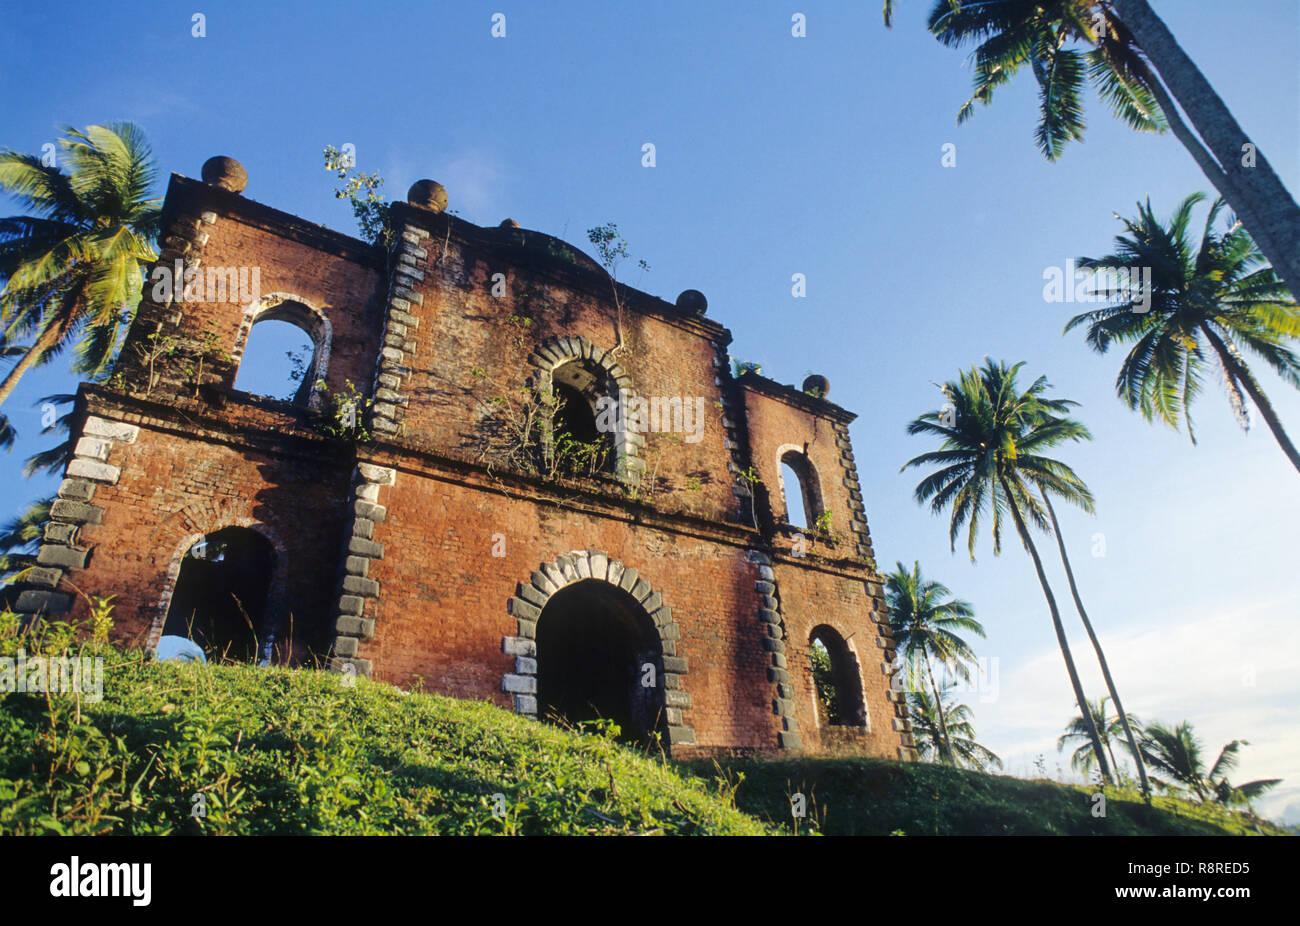 Gallows, Viper Island, Andaman Islands, India - Stock Image